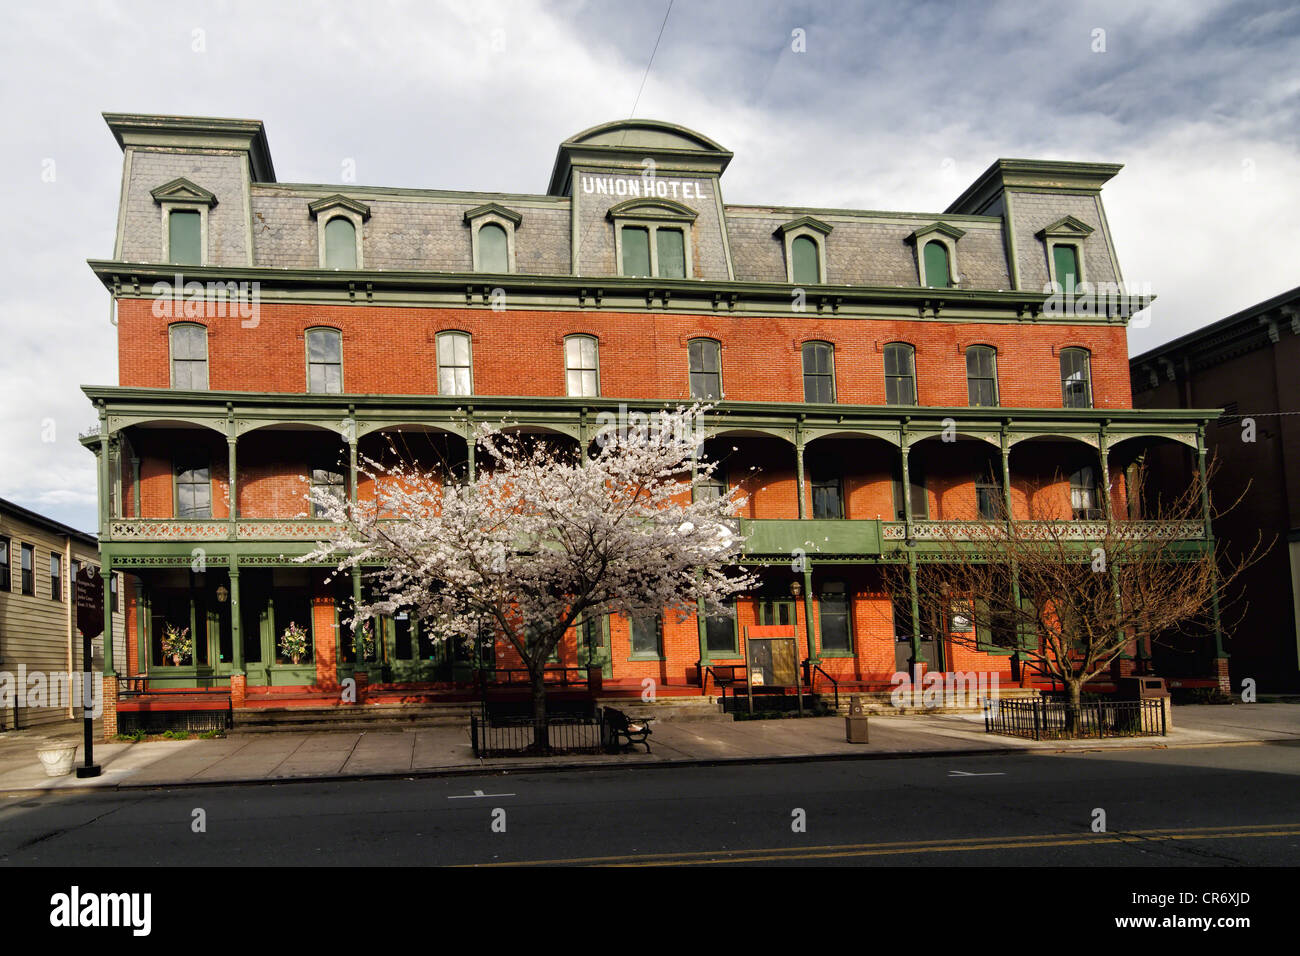 Vista frontal de la histórica Union Hotel en Flemington, Hunterdon County, New Jersey Imagen De Stock